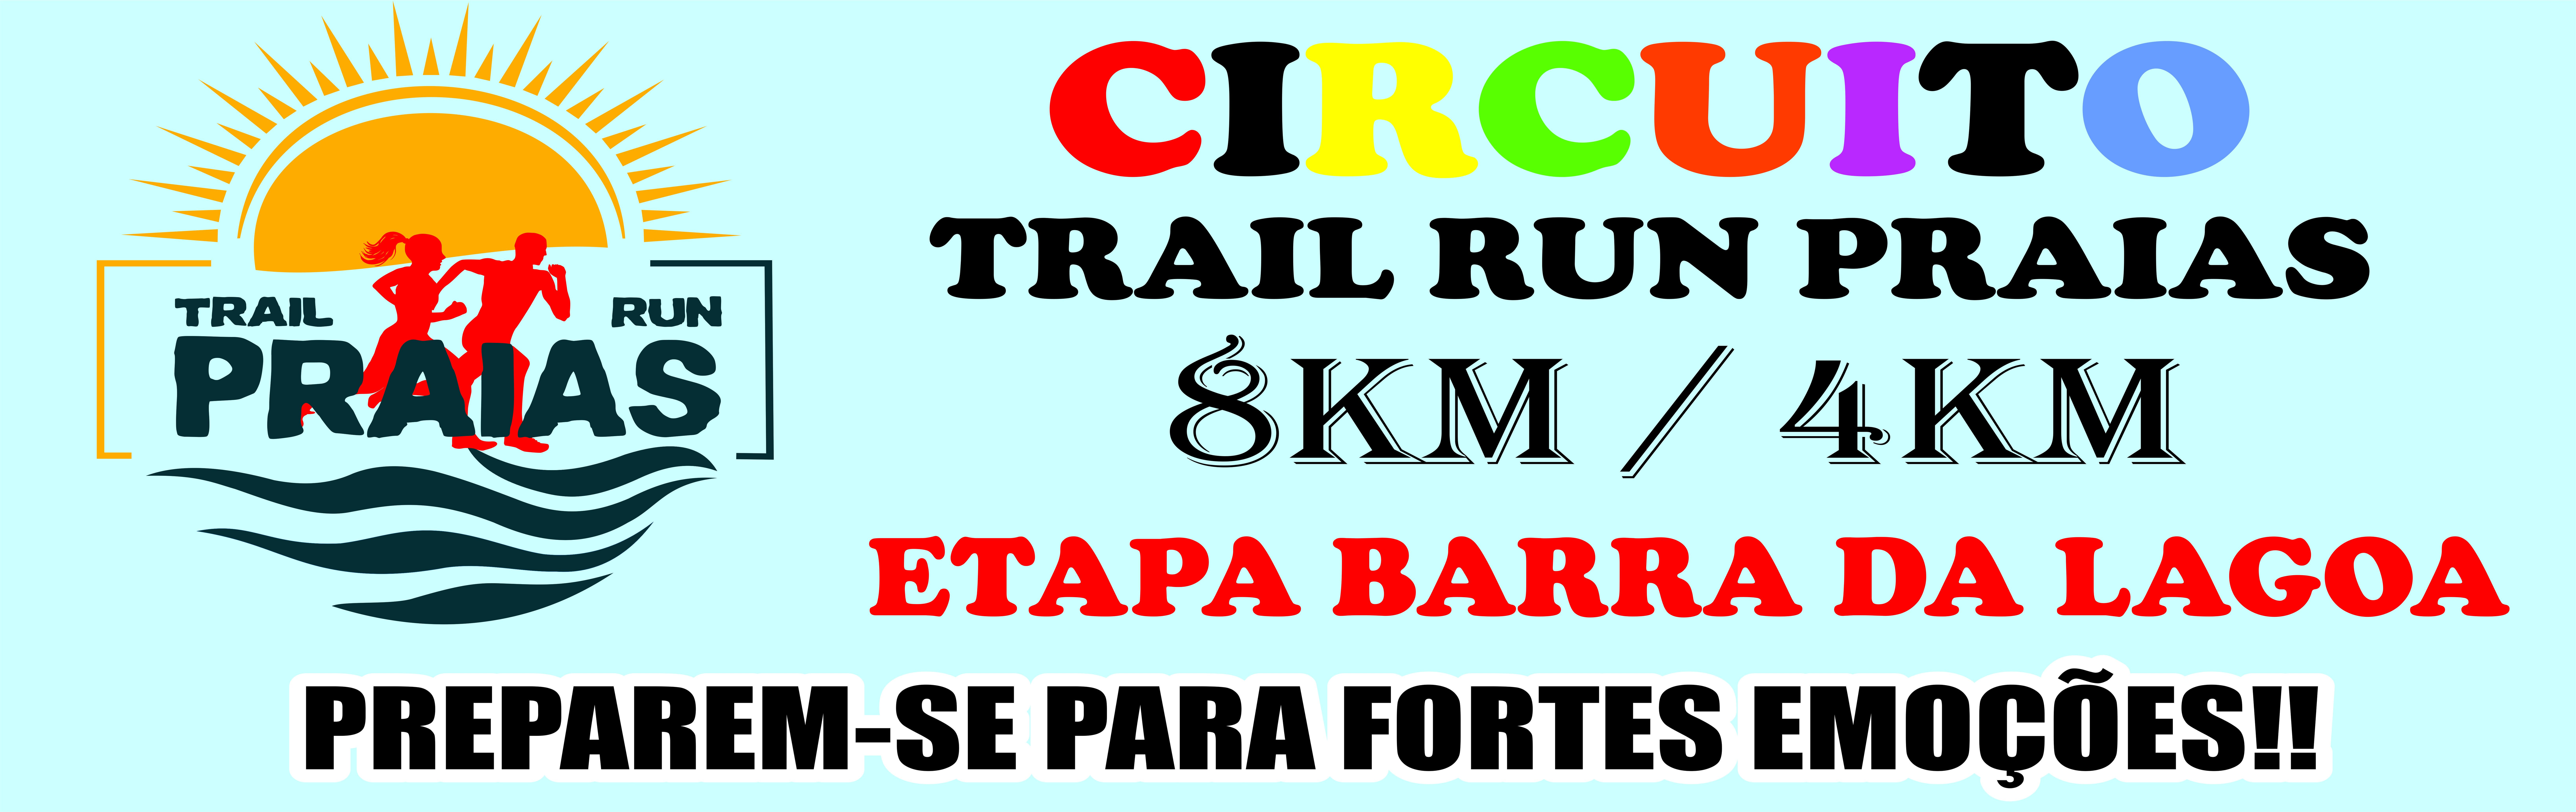 Trail Run Praias - Etapa Barra da Lagoa 2020